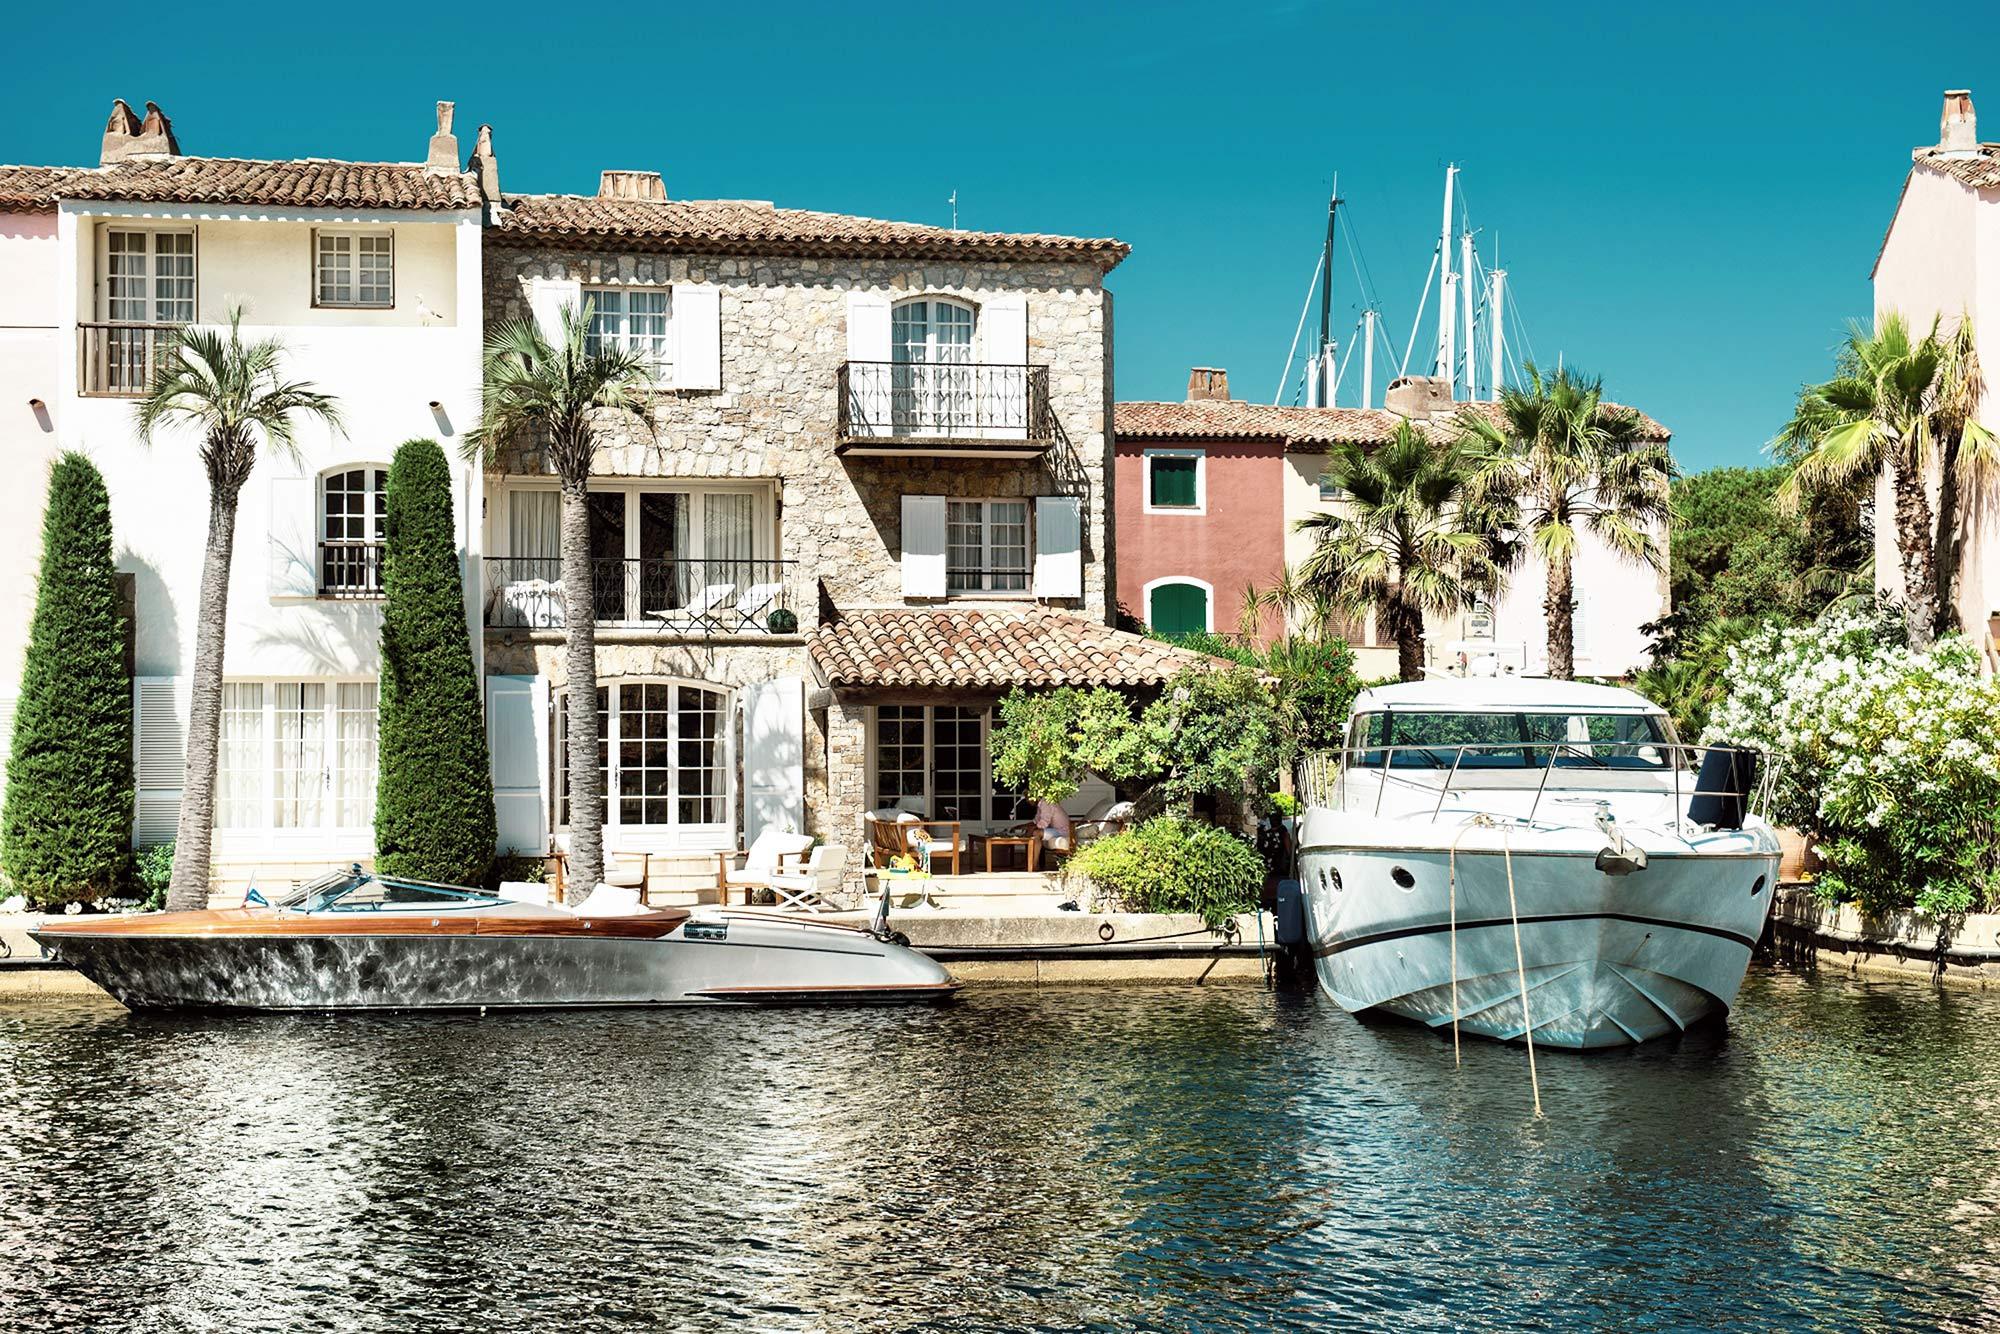 Costa Azzurra, Francia, Vacanze, Estate, Idee, Ispirazioni, Stile, Saint-Tropez